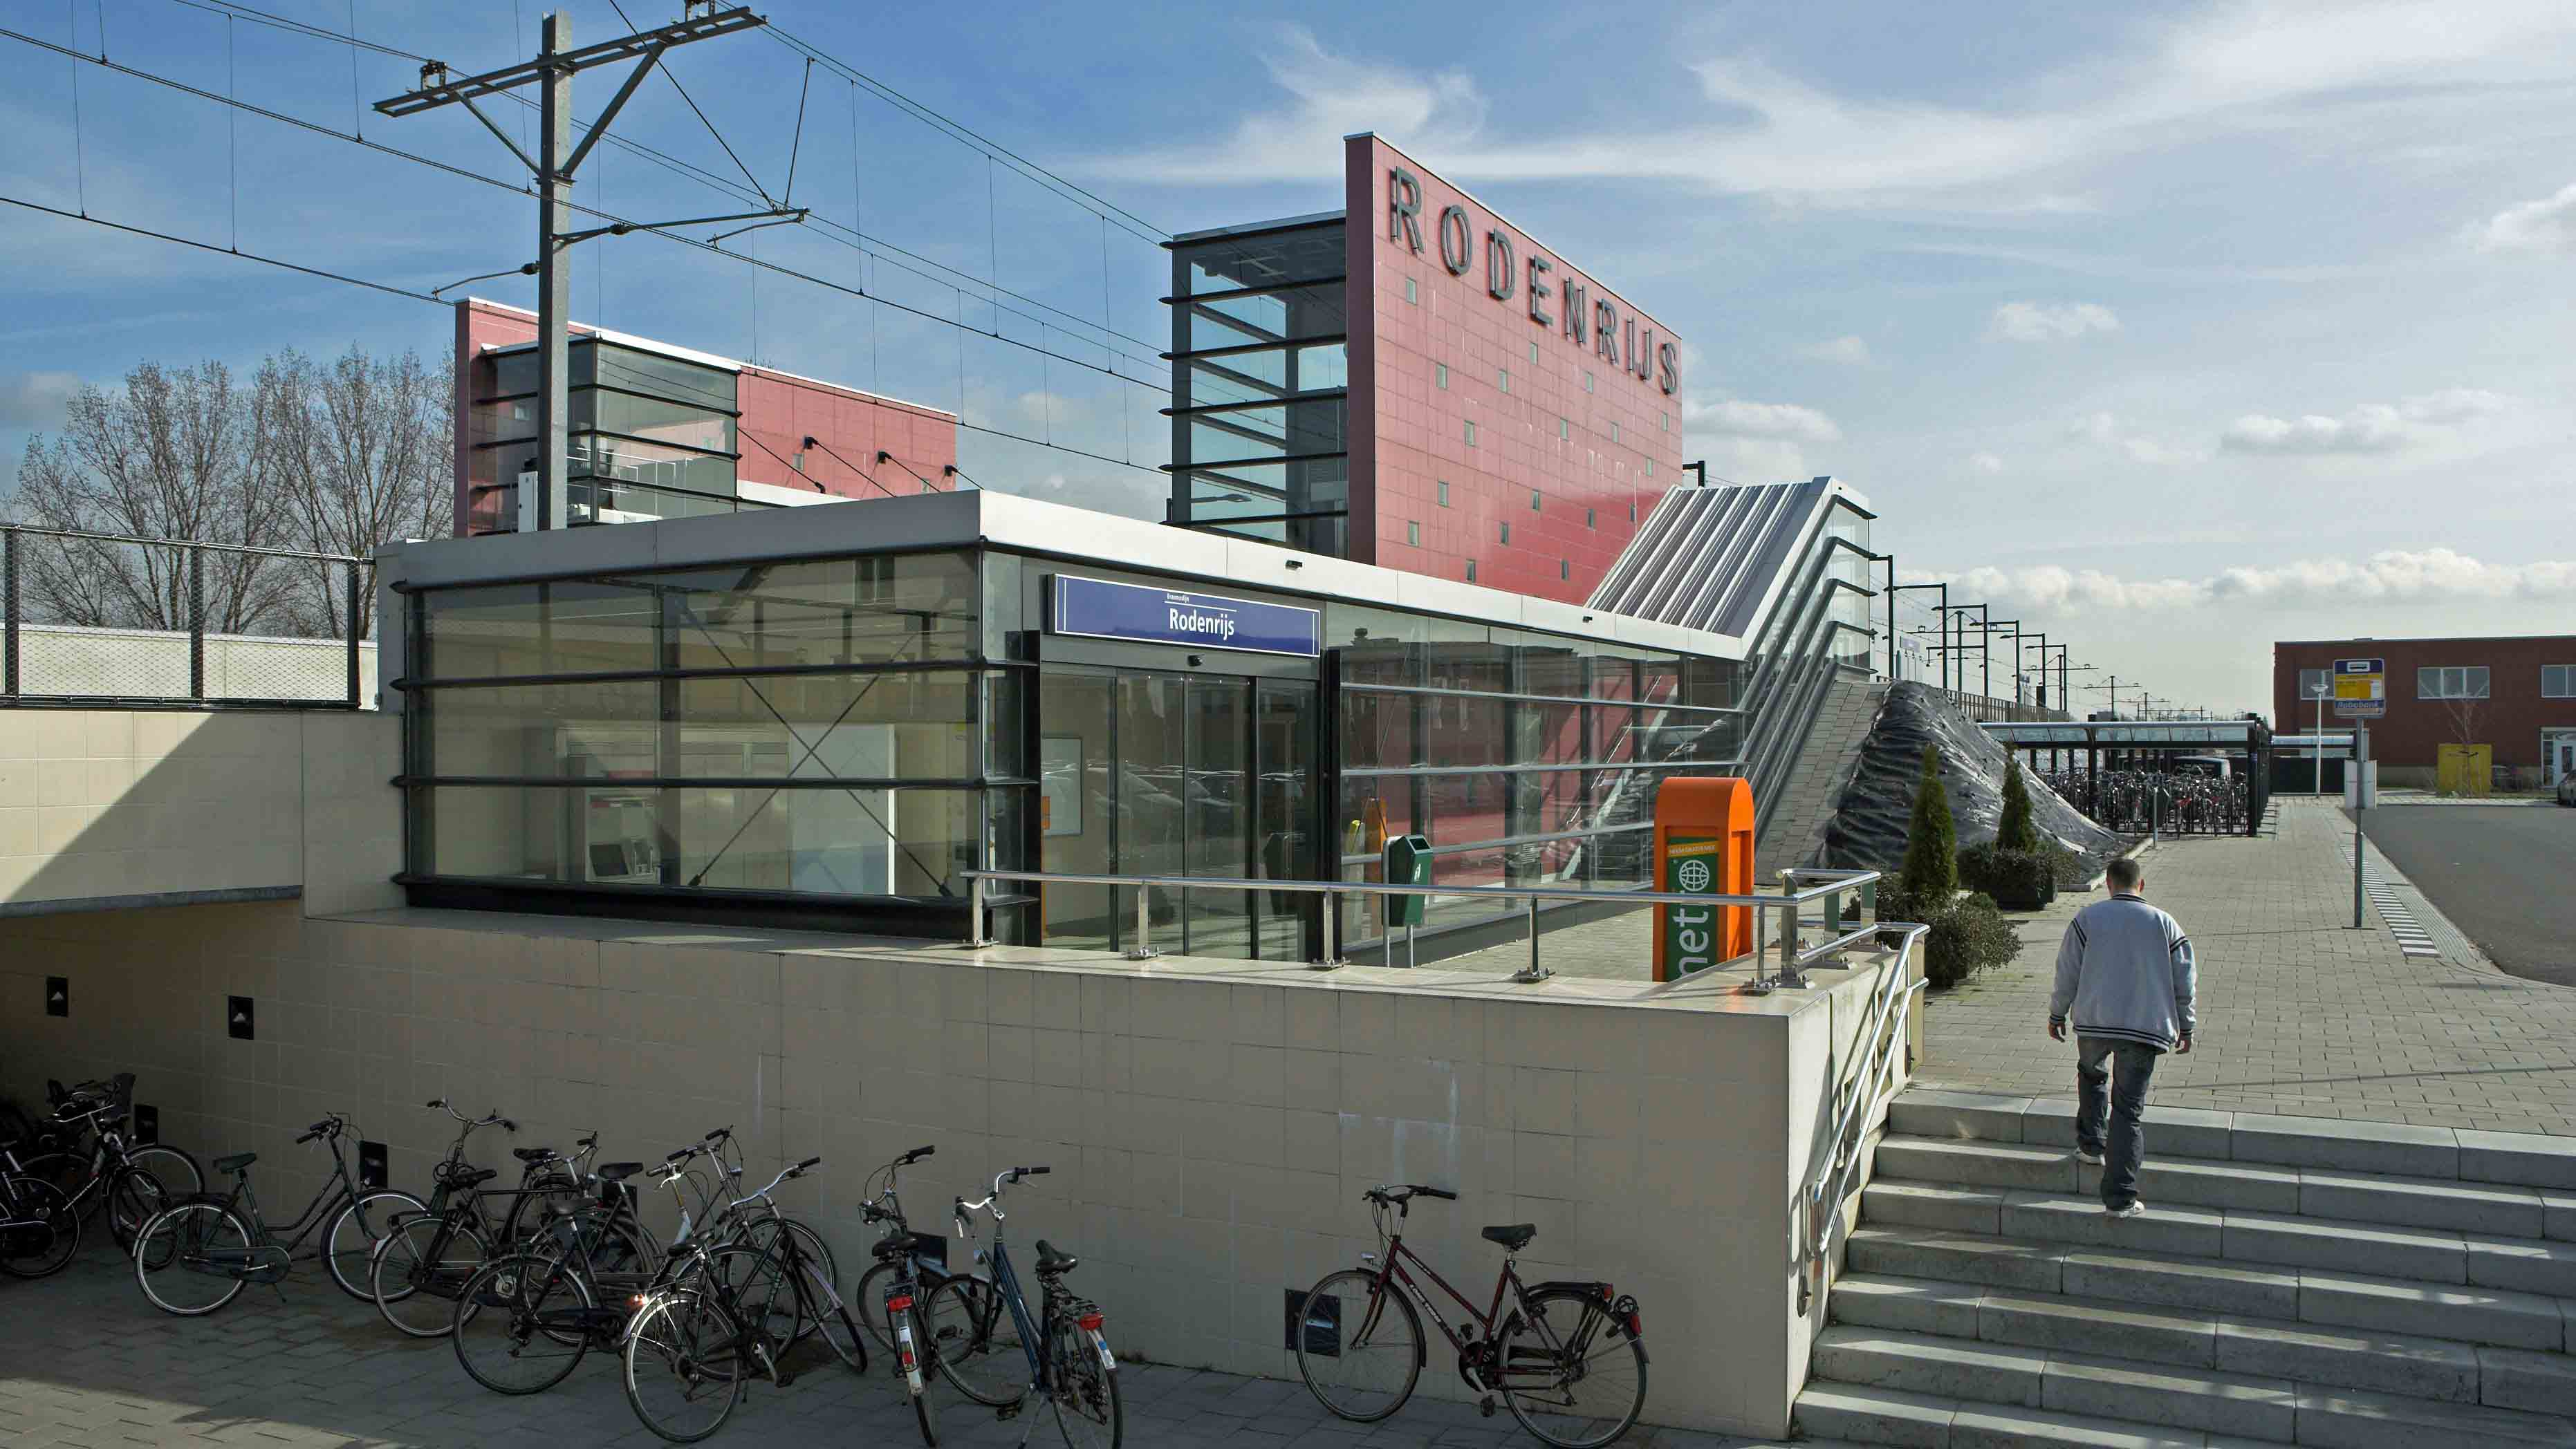 station rodenrijs architect marja haring